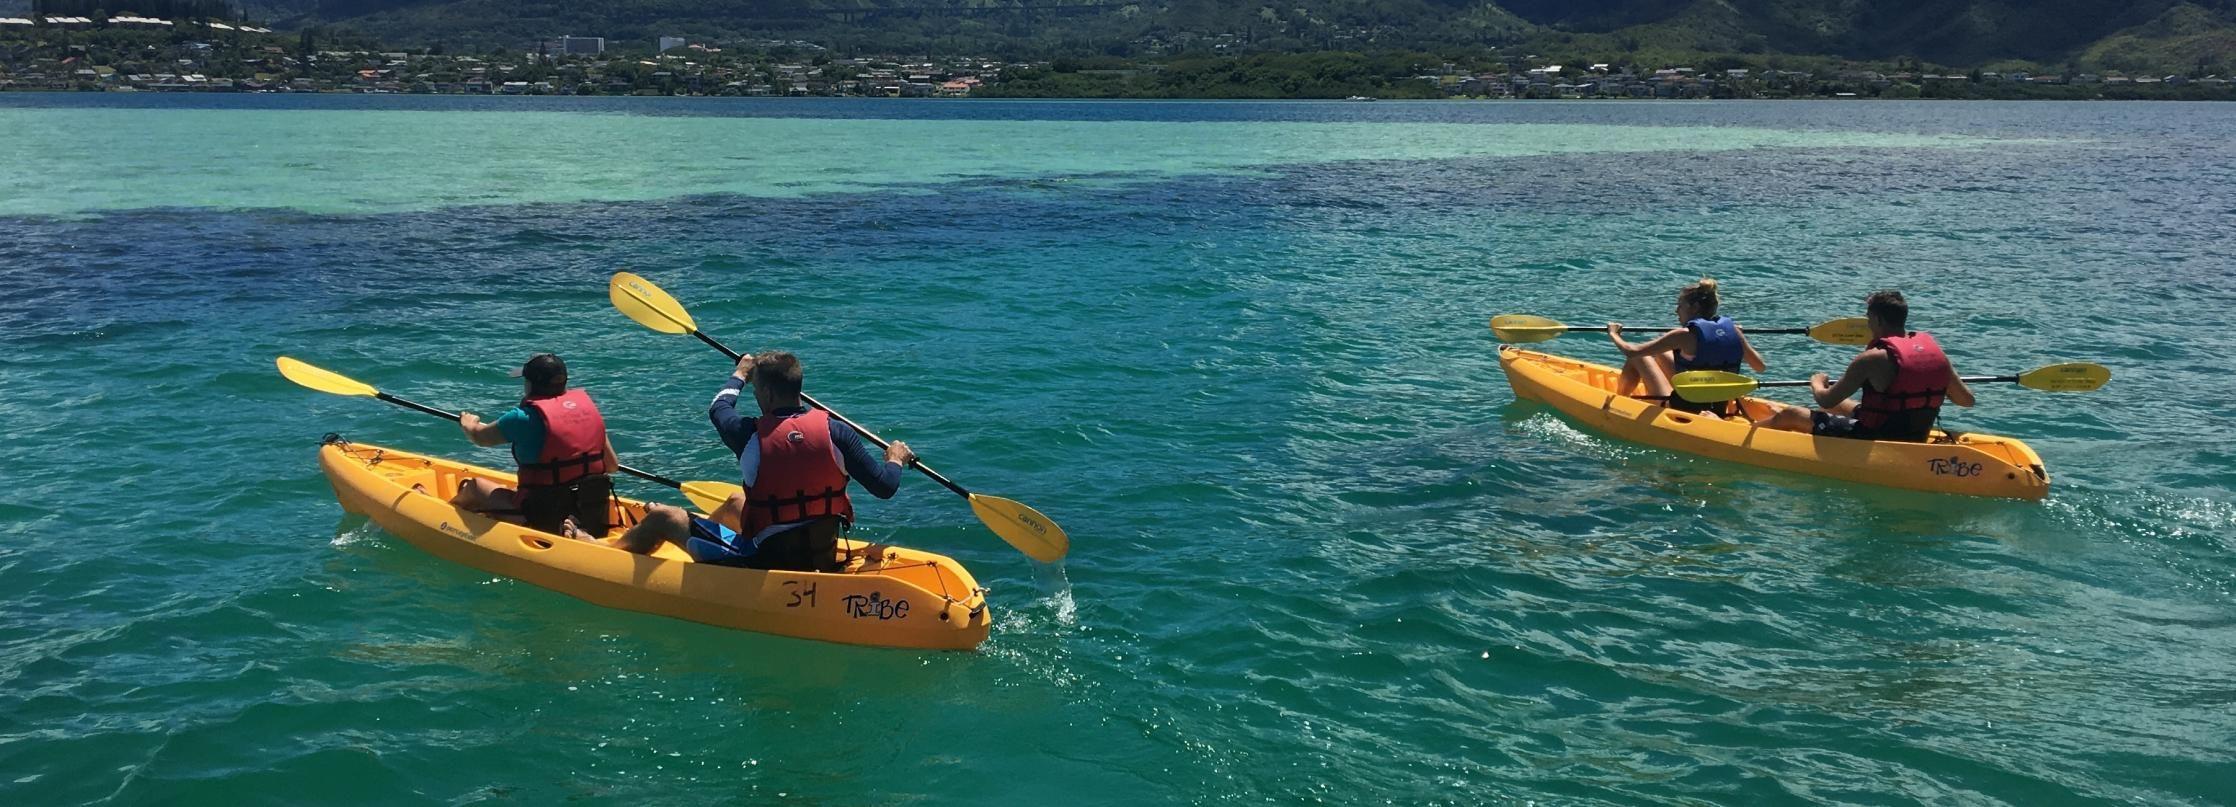 Oahu: Kane'ohe Bay Kayak Rentals